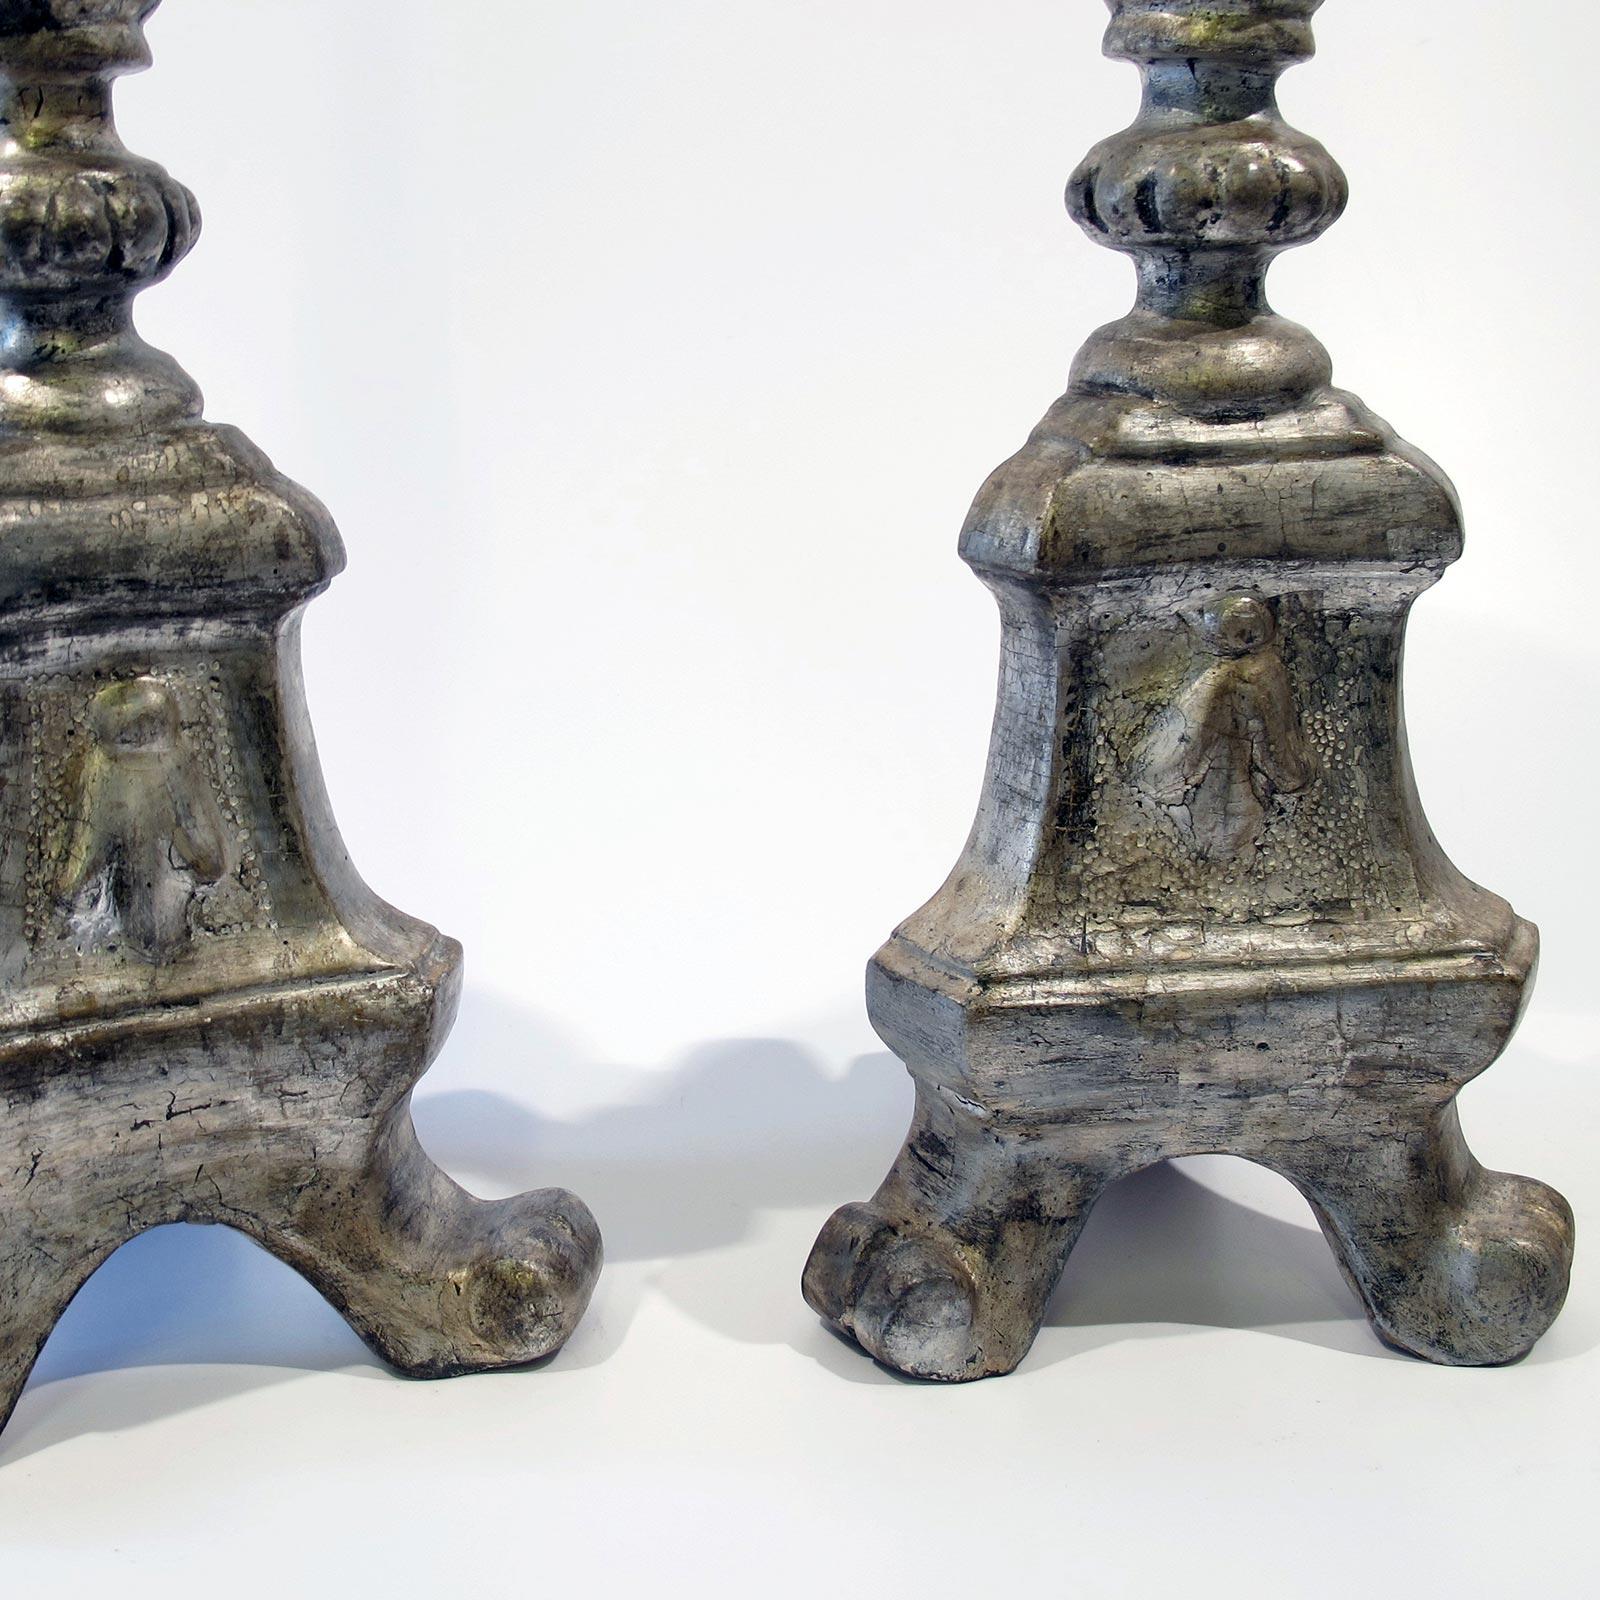 candeliere-studio17-caterina-sbrana-gabriele-mallegni-0